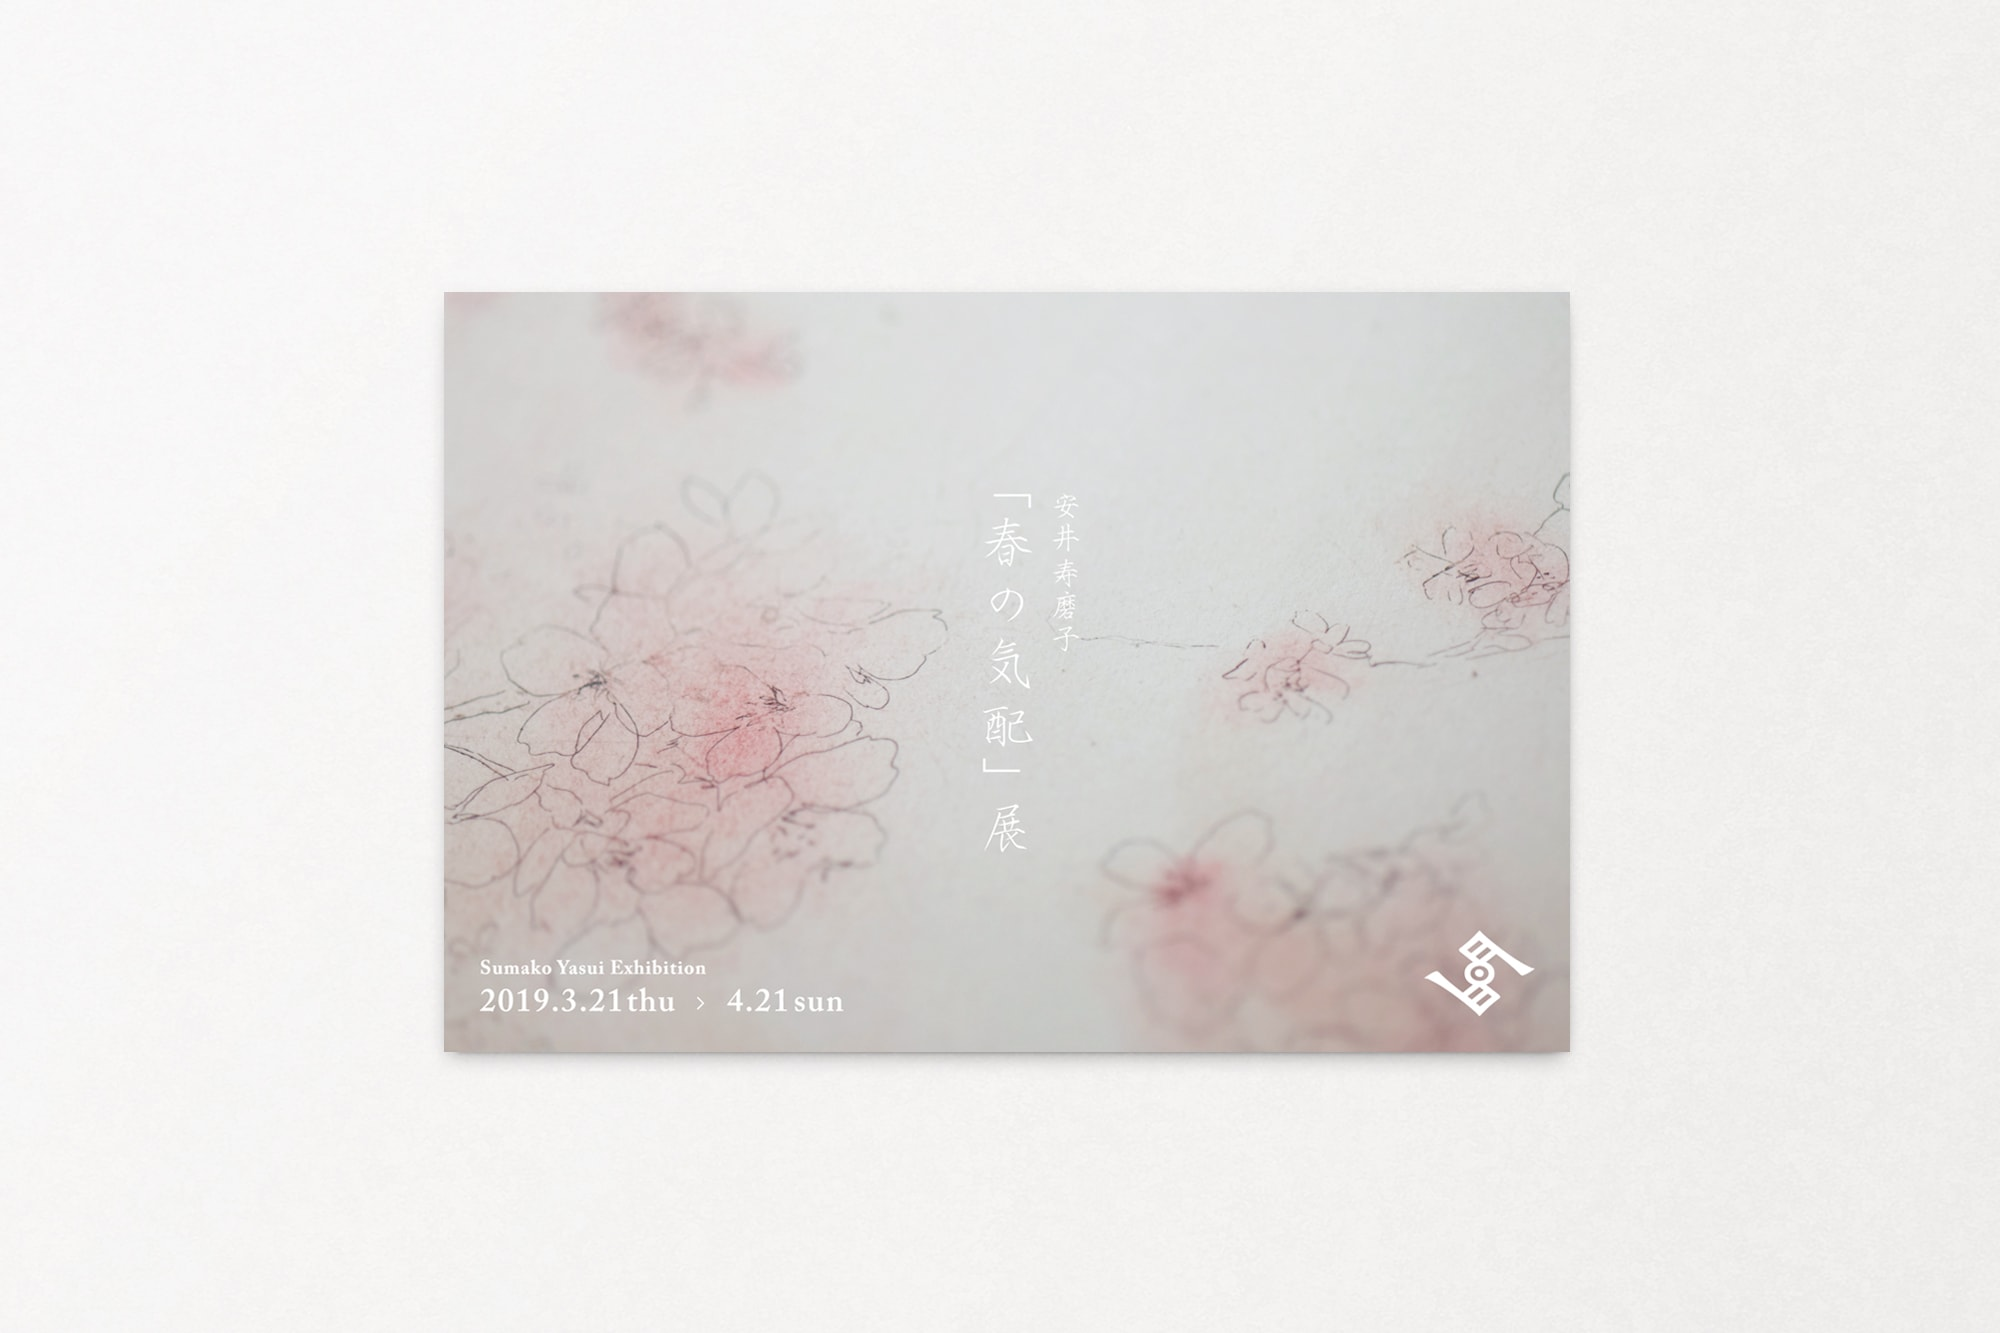 安井寿磨子「春の気配」展